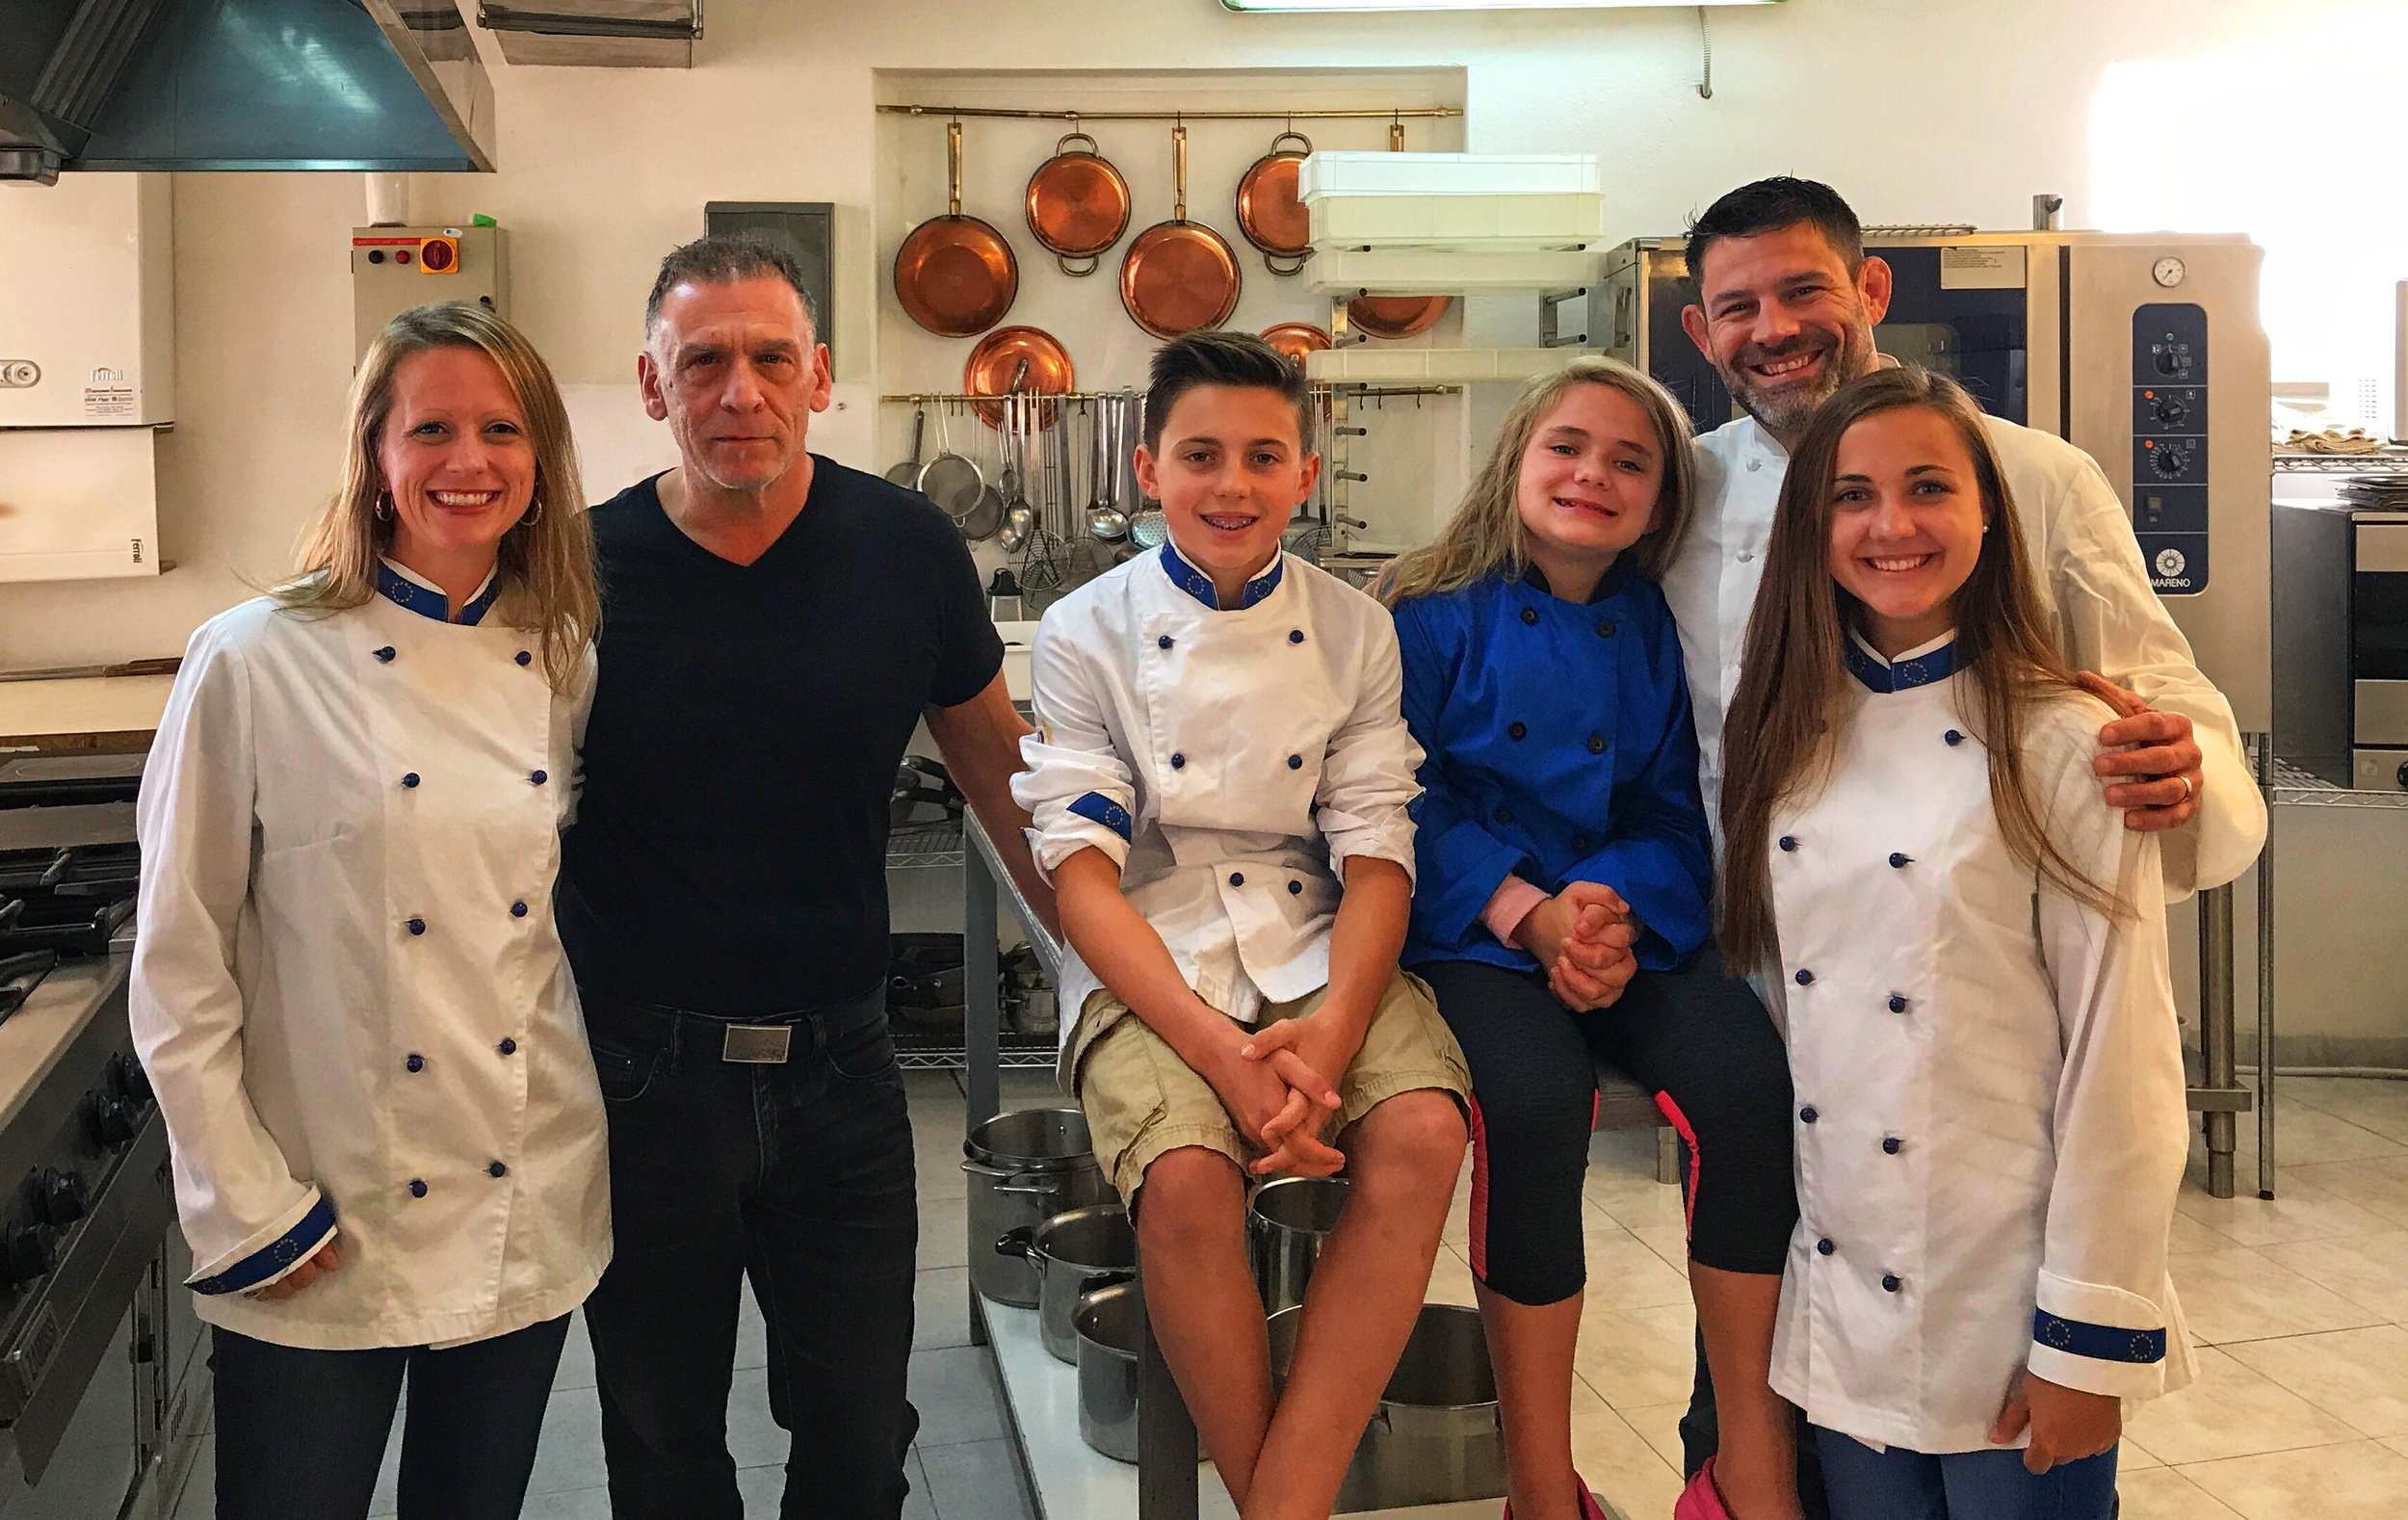 Chef John and family